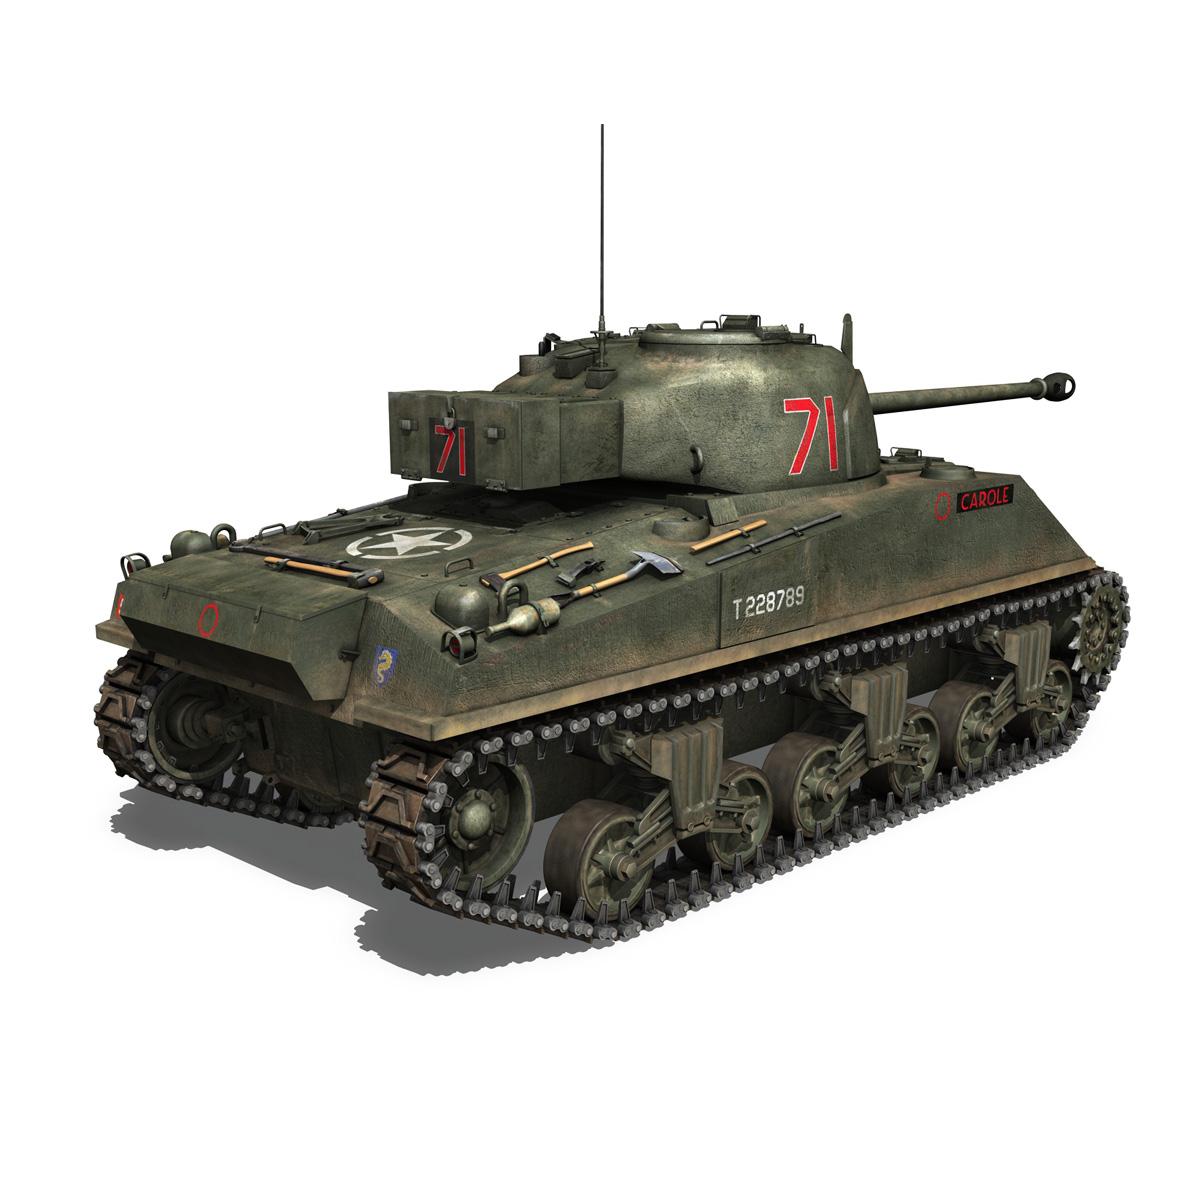 sherman mk vc firefly - karols 3d modelis 3ds fbx c4d lwo obj 267431